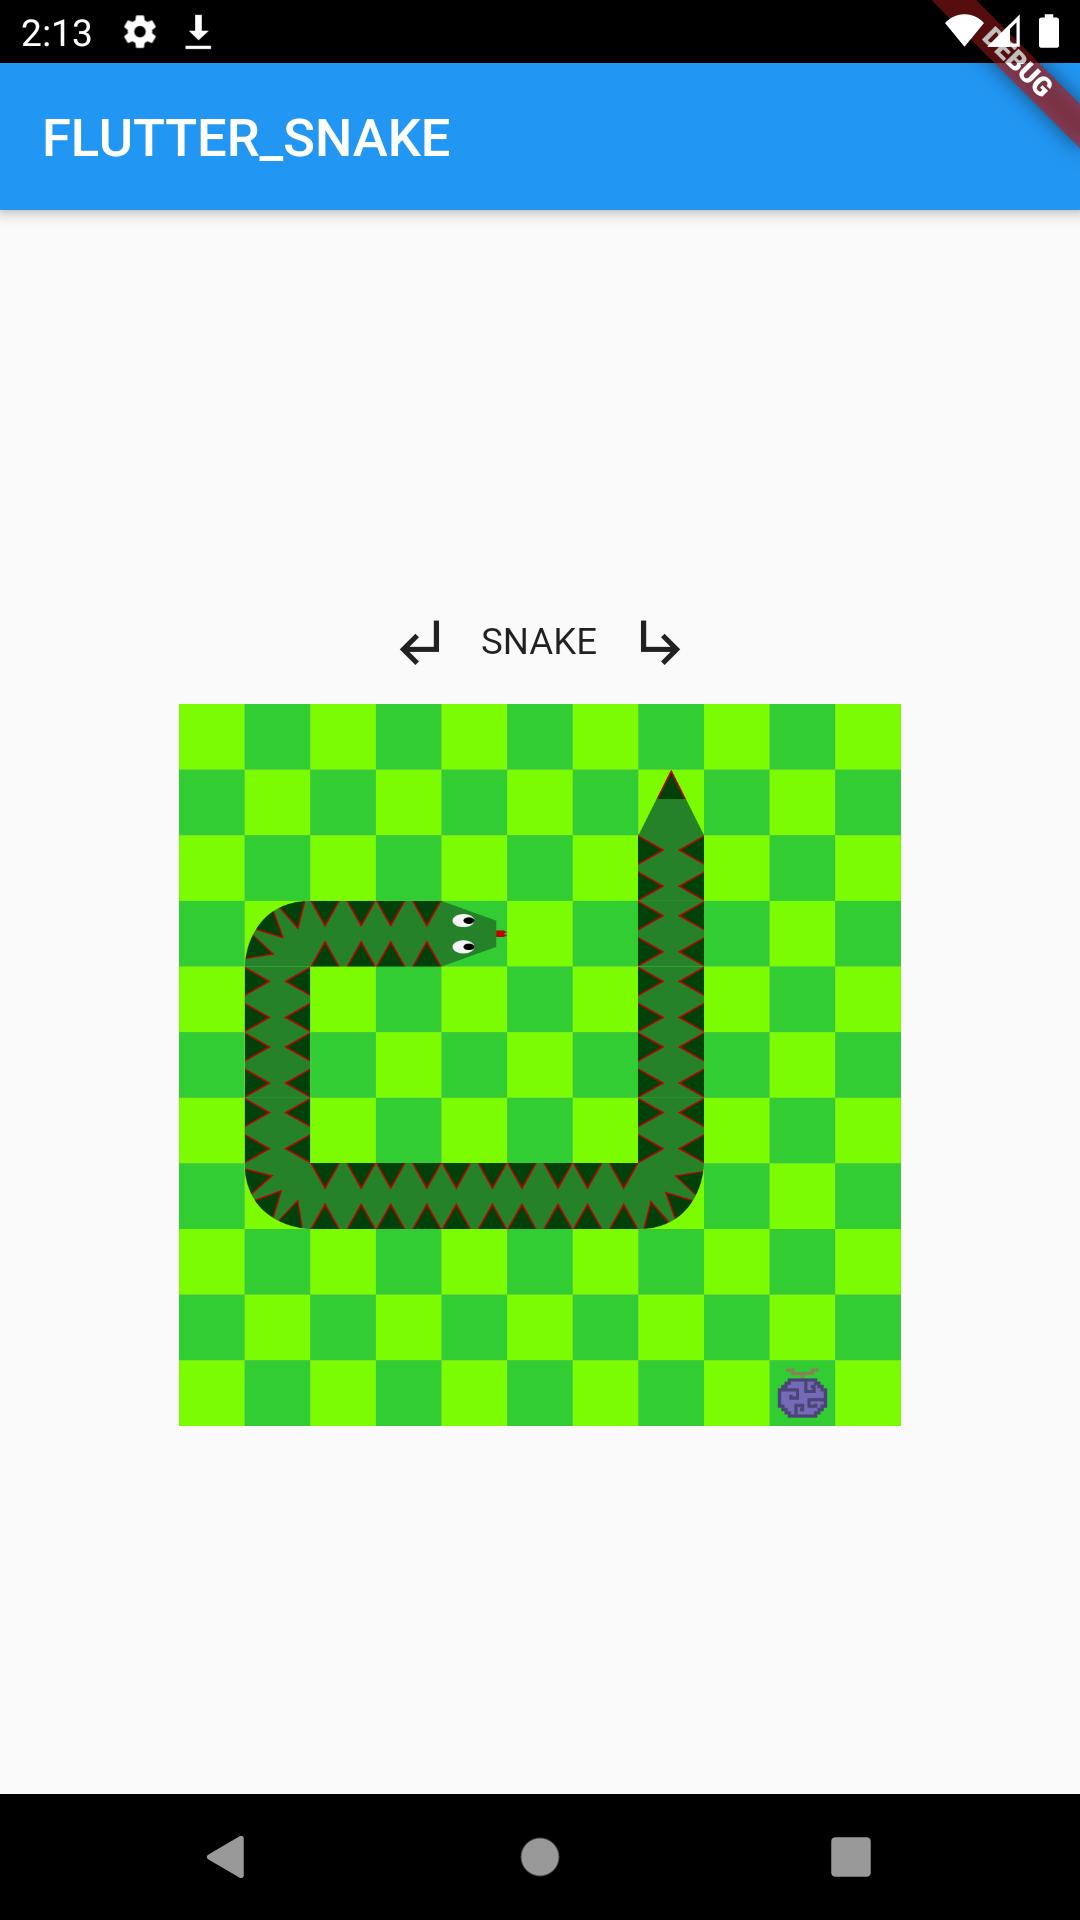 A big snake